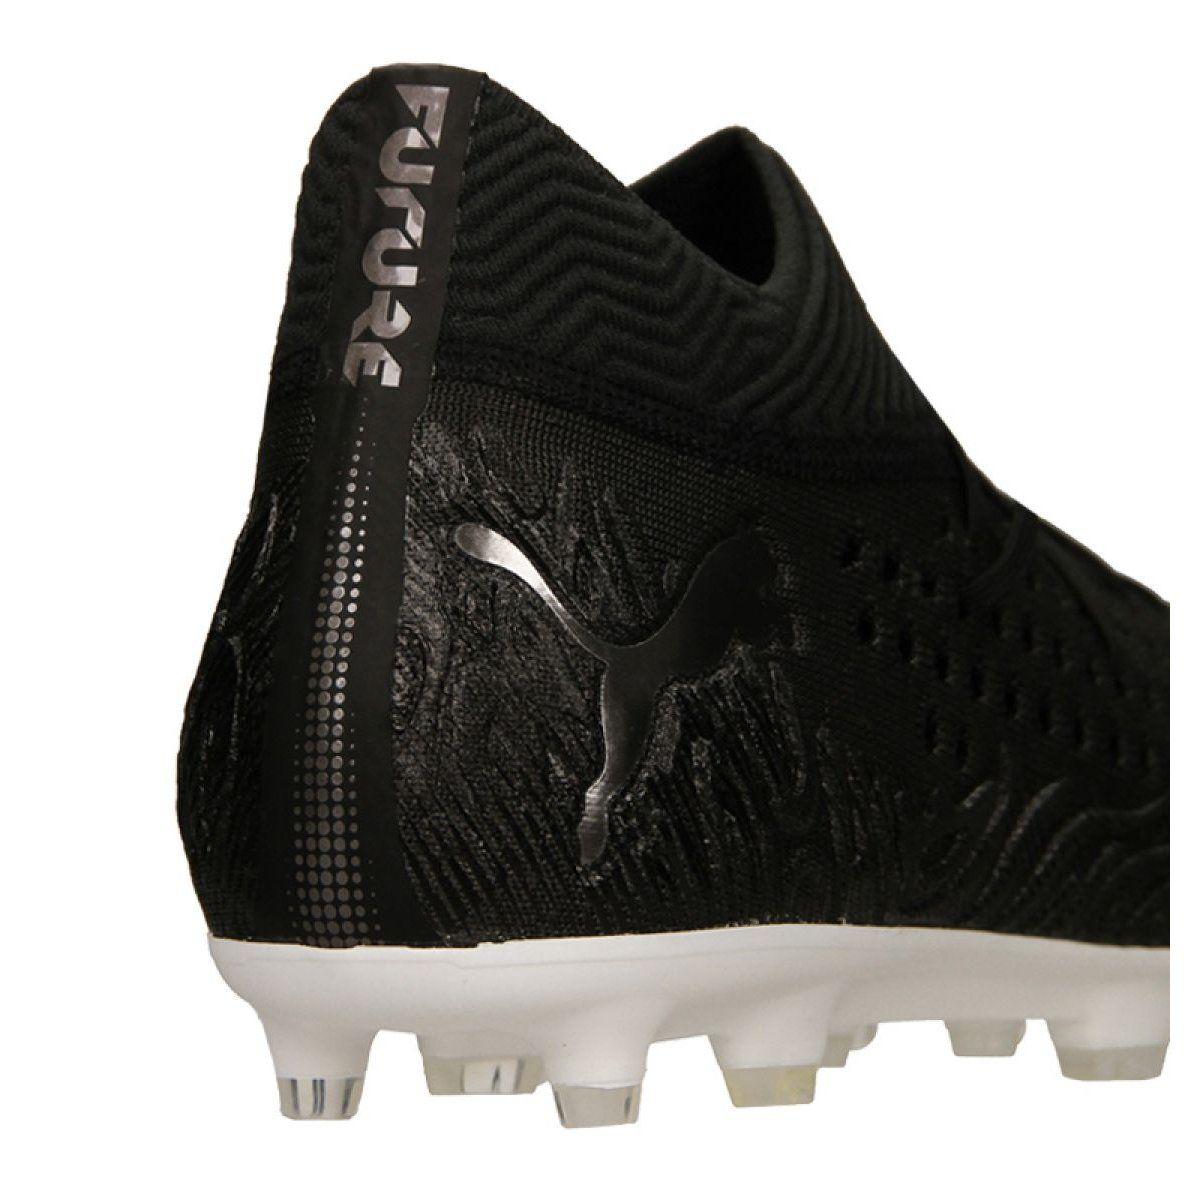 Buty Pilkarskie Puma Future 19 1 Netfit Fg Ag M 105531 02 Czarne Czarne Black Boots Football Boots Boots